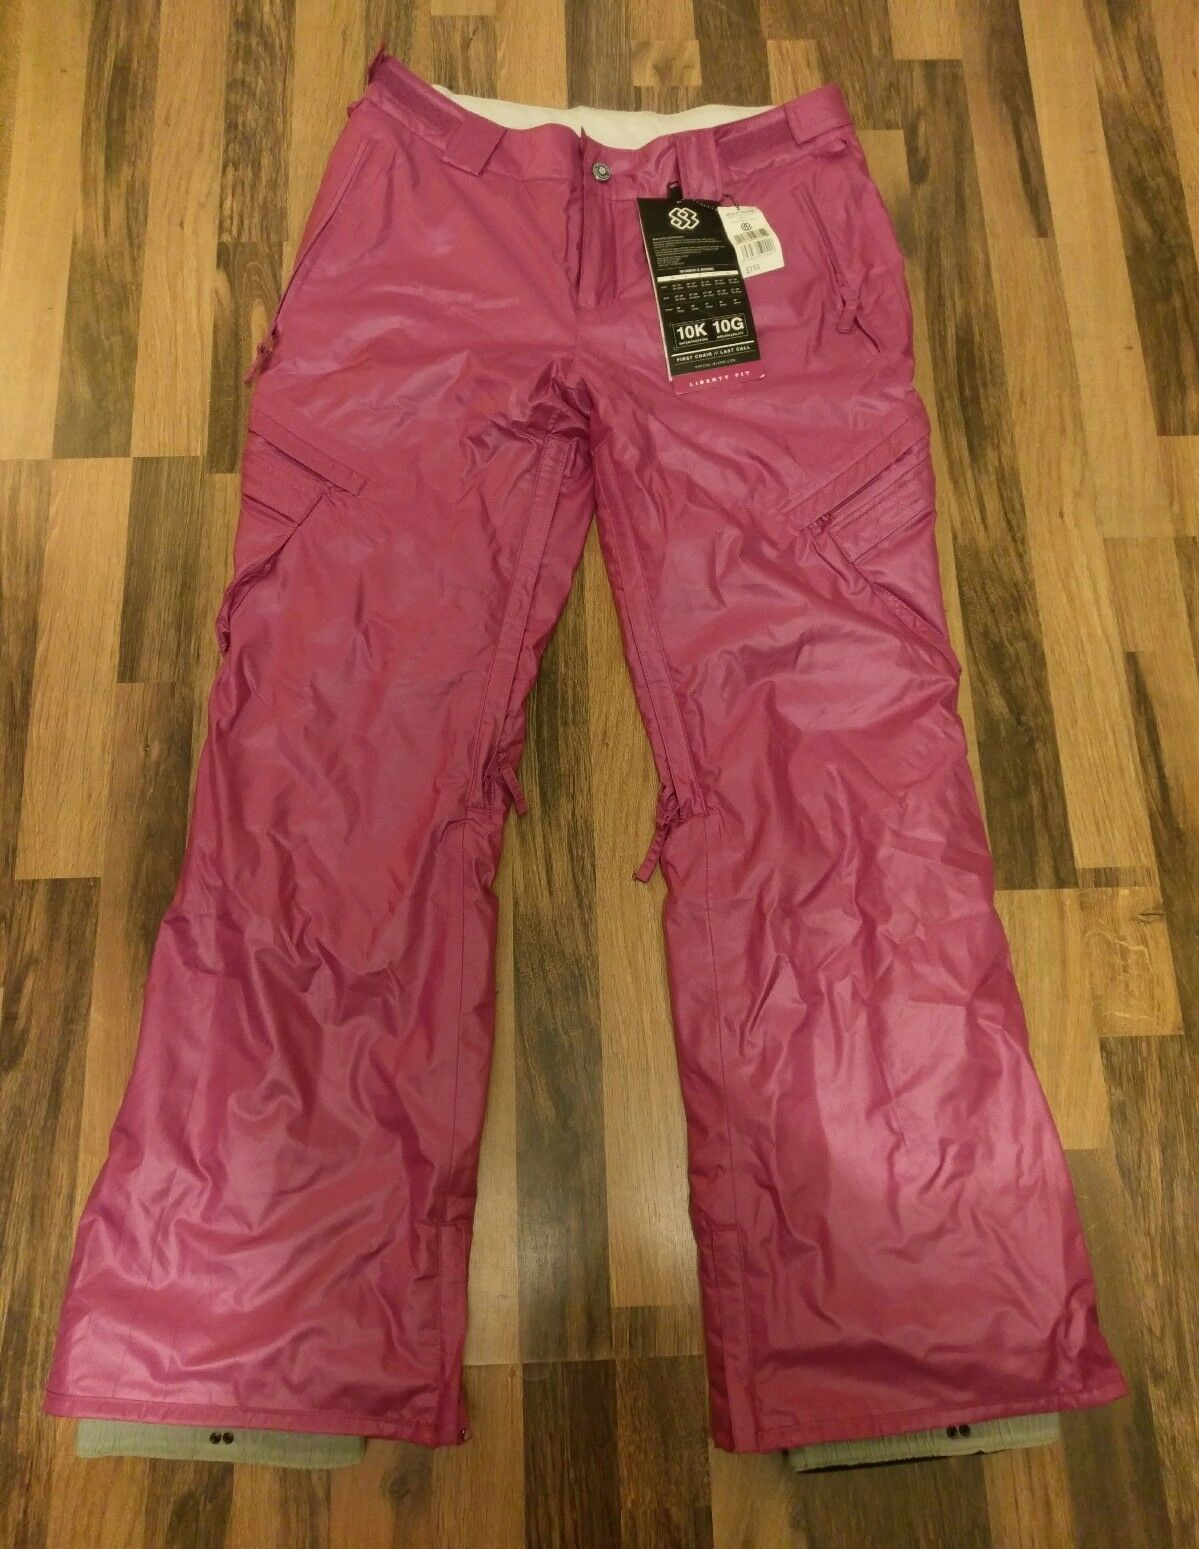 Damenschuhe snowboard trousers Größe M SPECIAL BLEND, London  B392